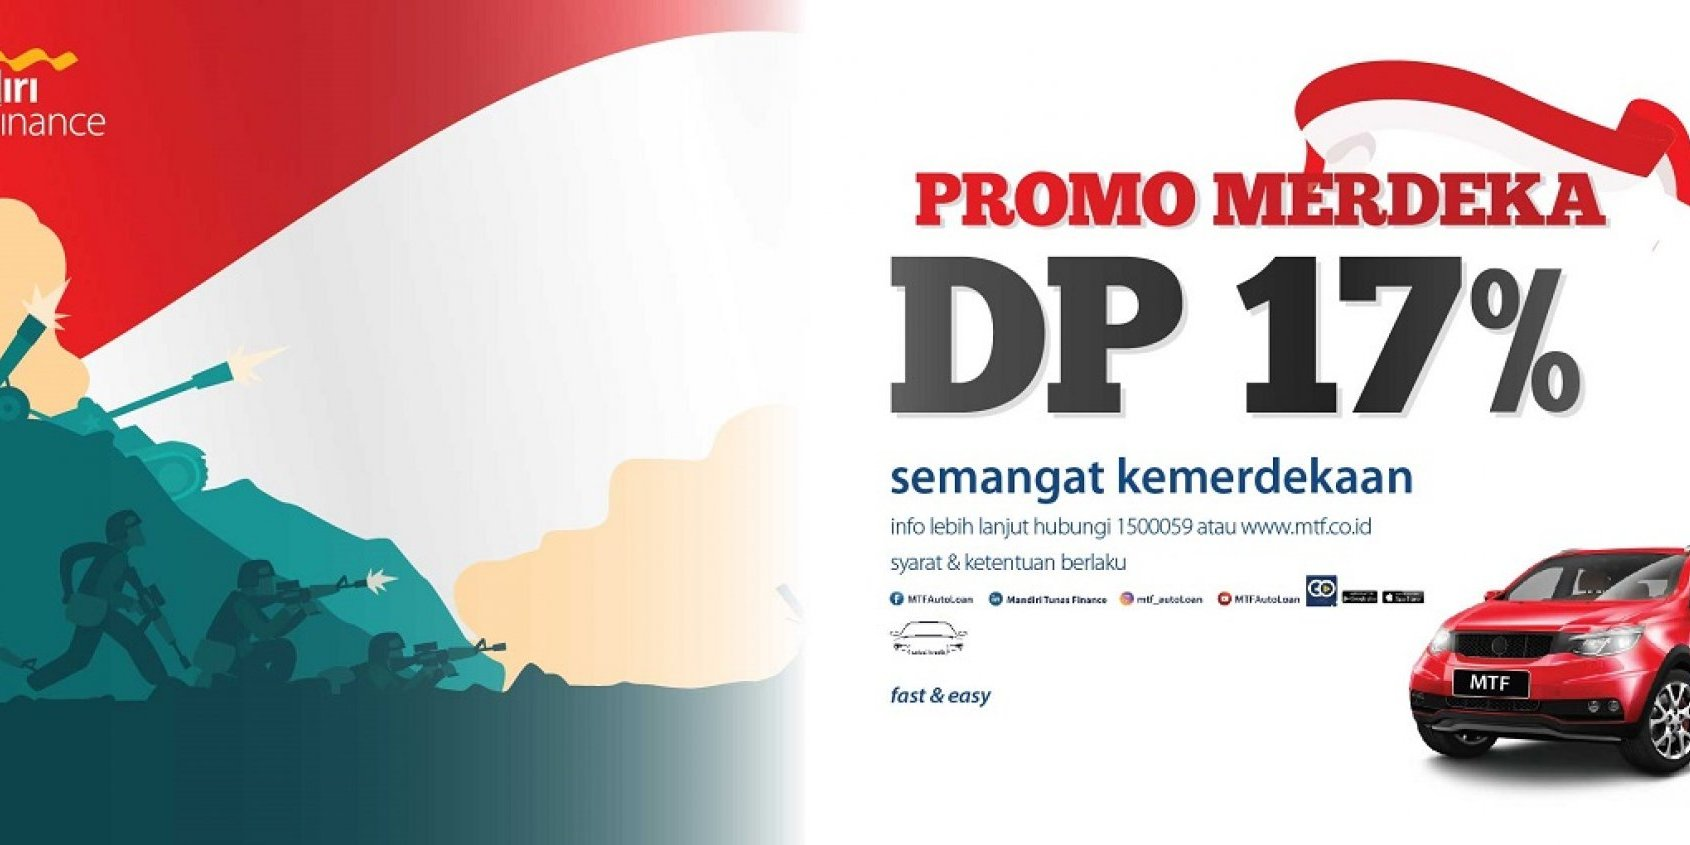 Promo Merdeka DP 17%